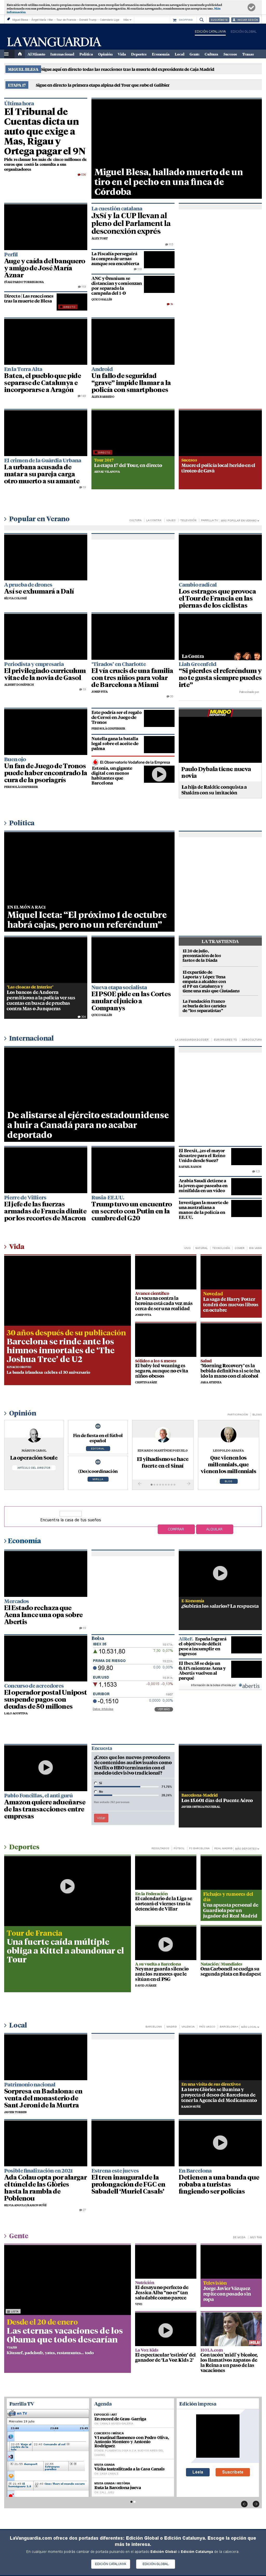 La Vanguardia at Wednesday July 19, 2017, 1:32 p.m. UTC